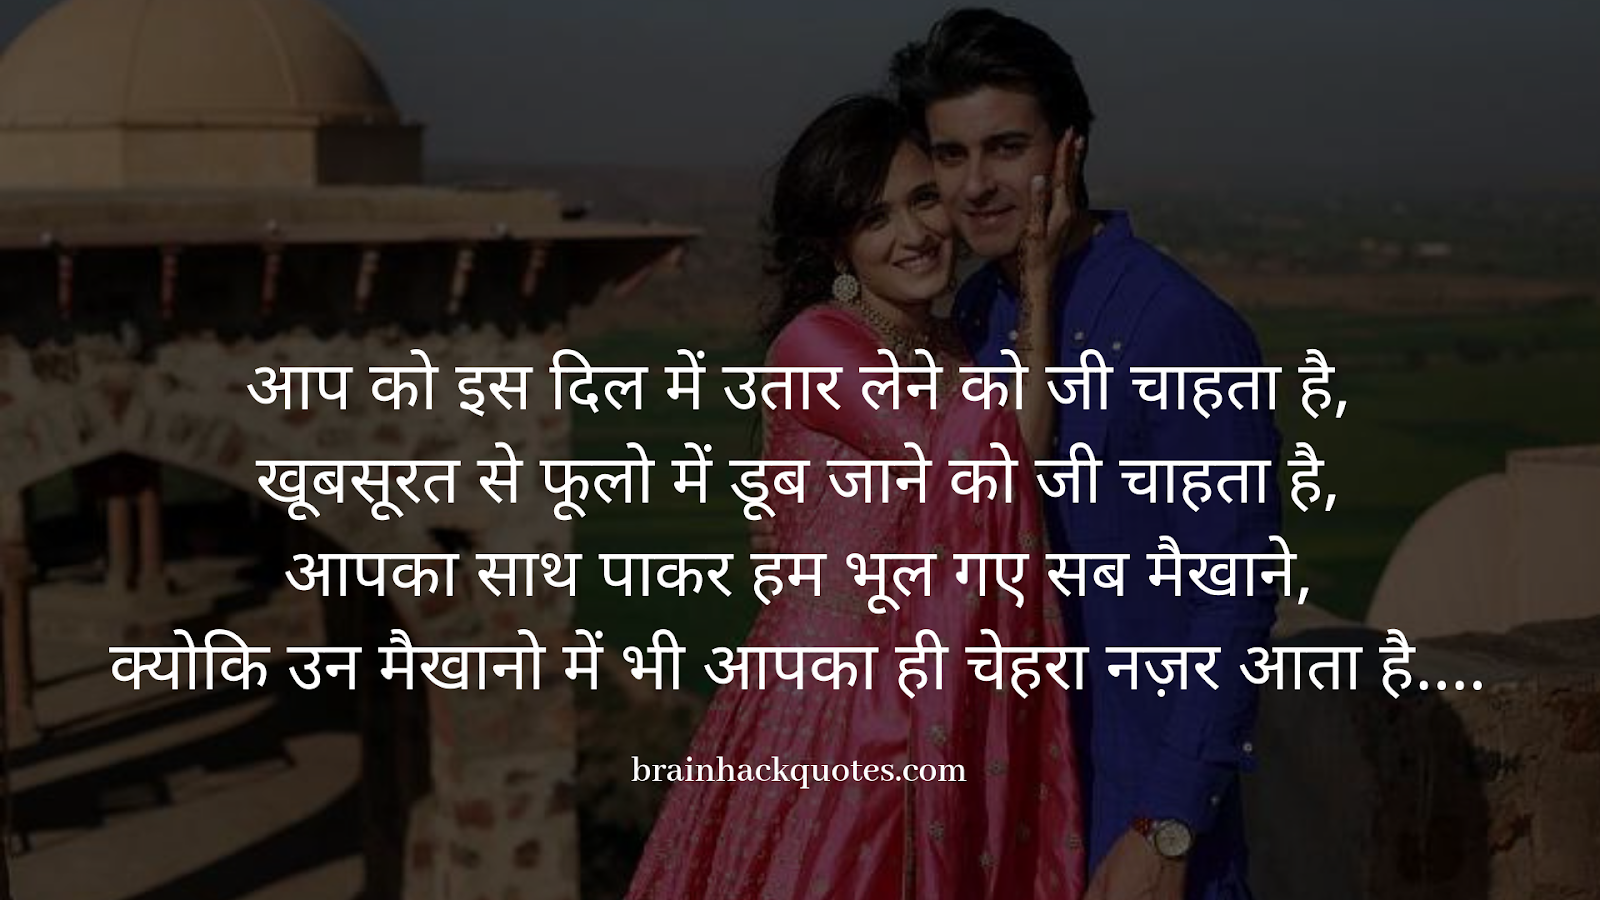 Love Shayari Dil Se Dil Mile Hote Toh- Brain Hack Quotes